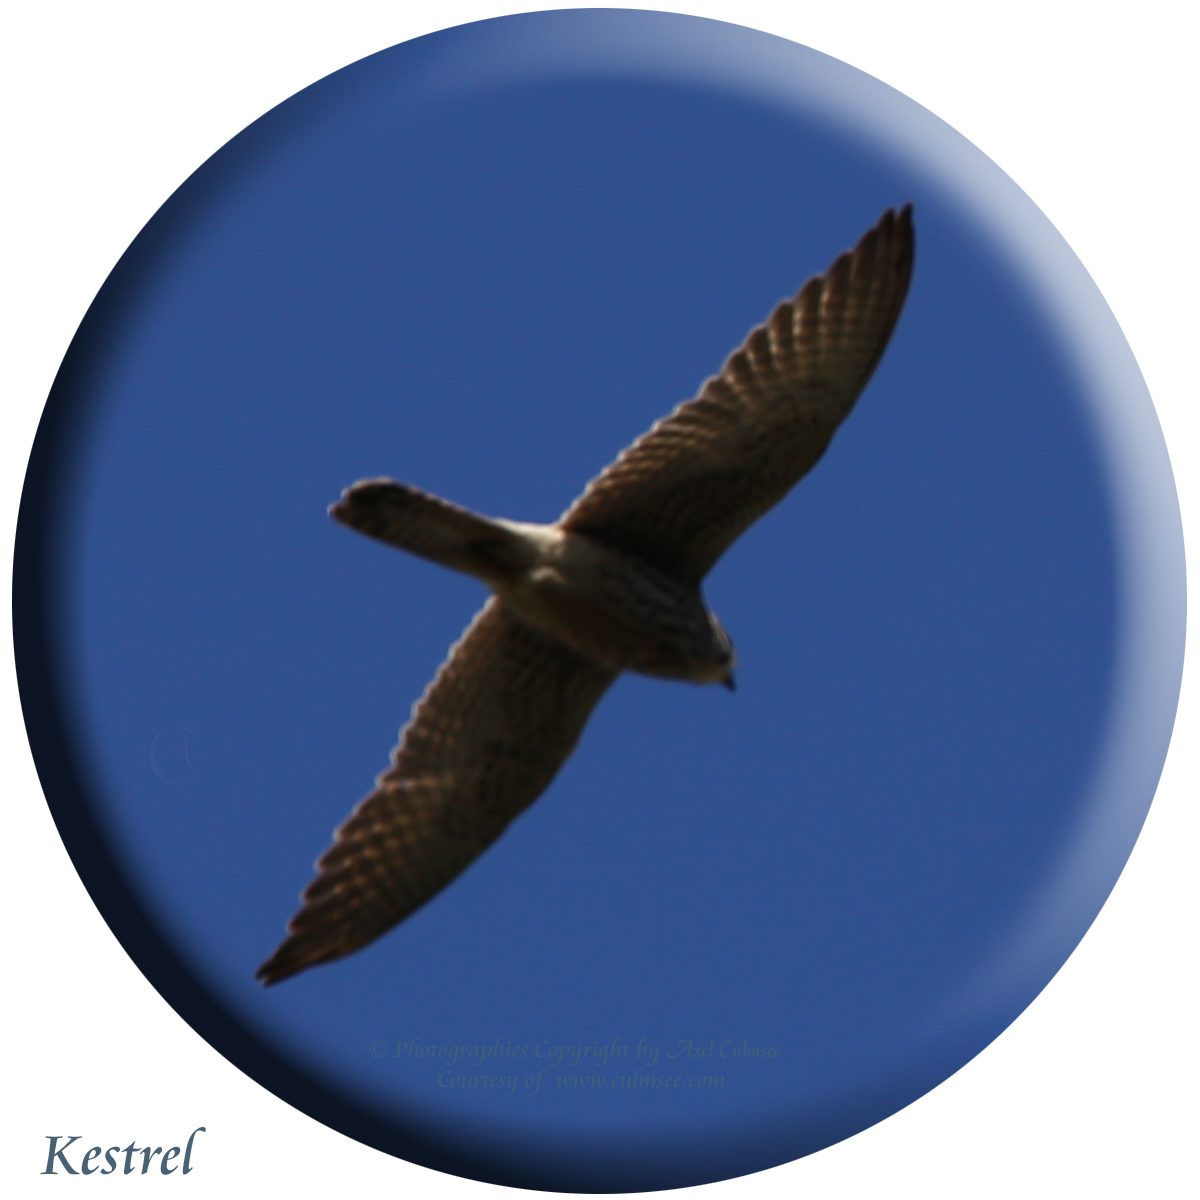 Falco tinnunculus, Kestrel, Turmfalke